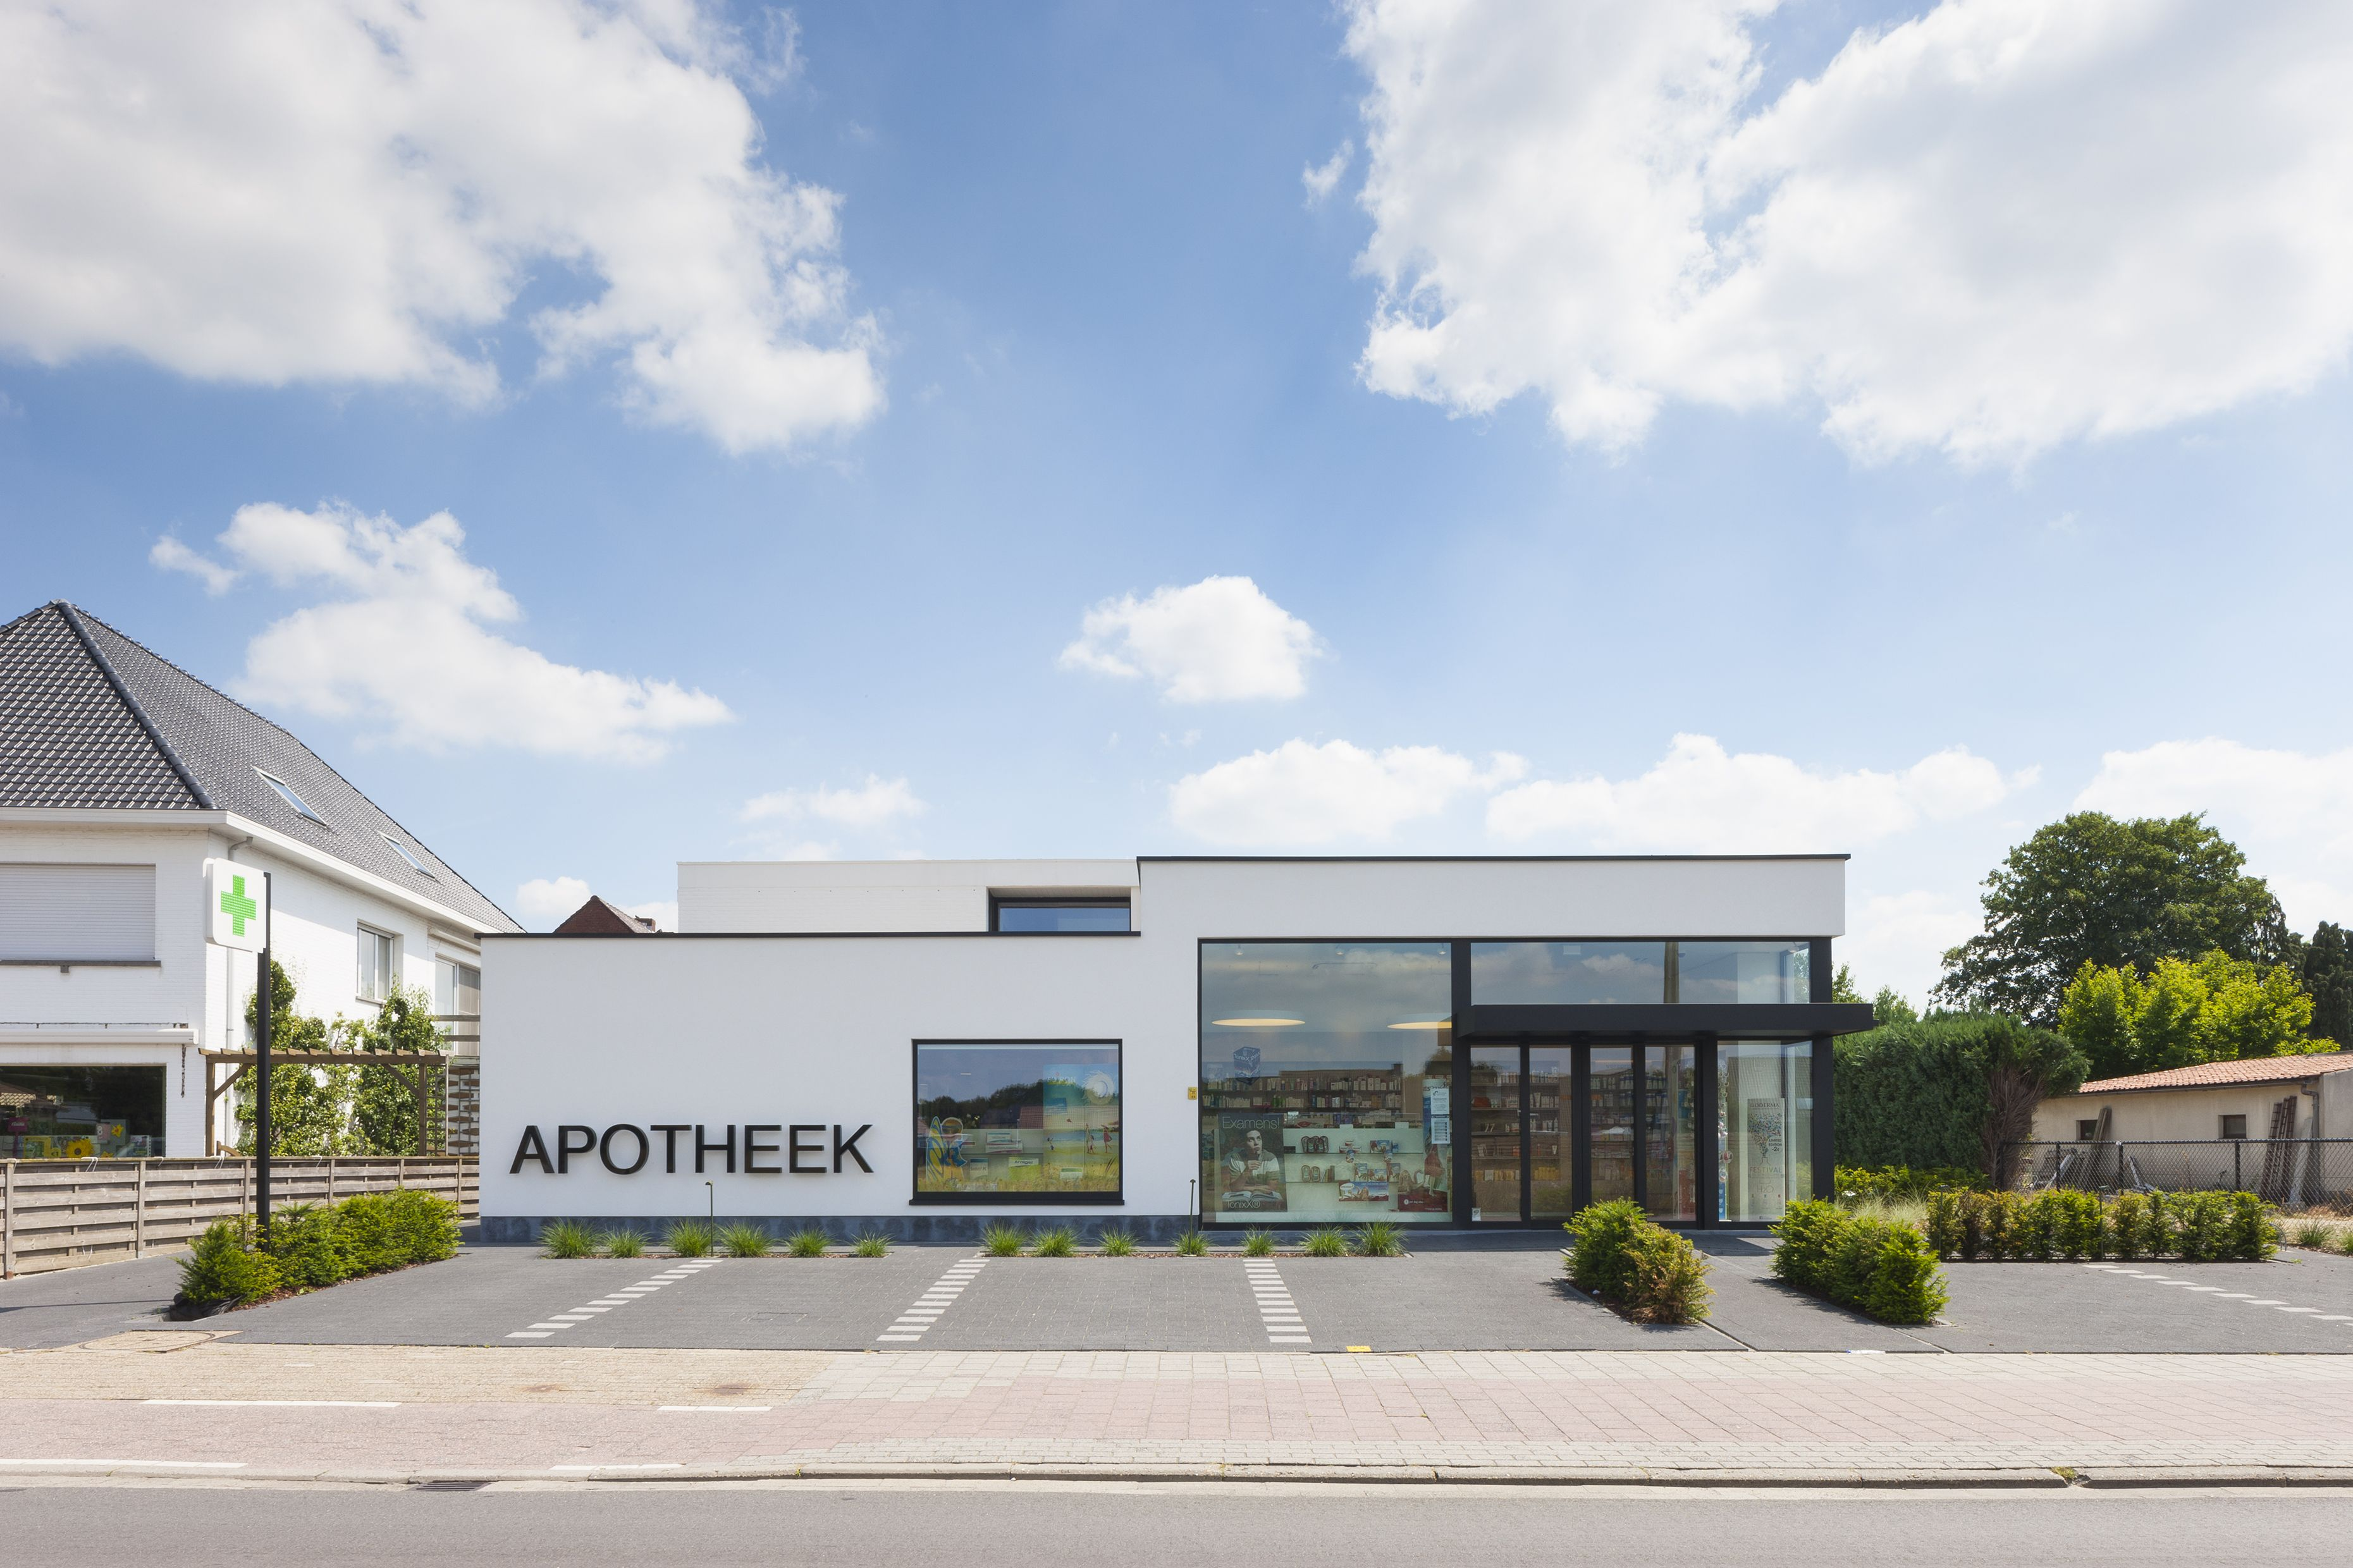 moderne apotheek | apotheek | Pinterest